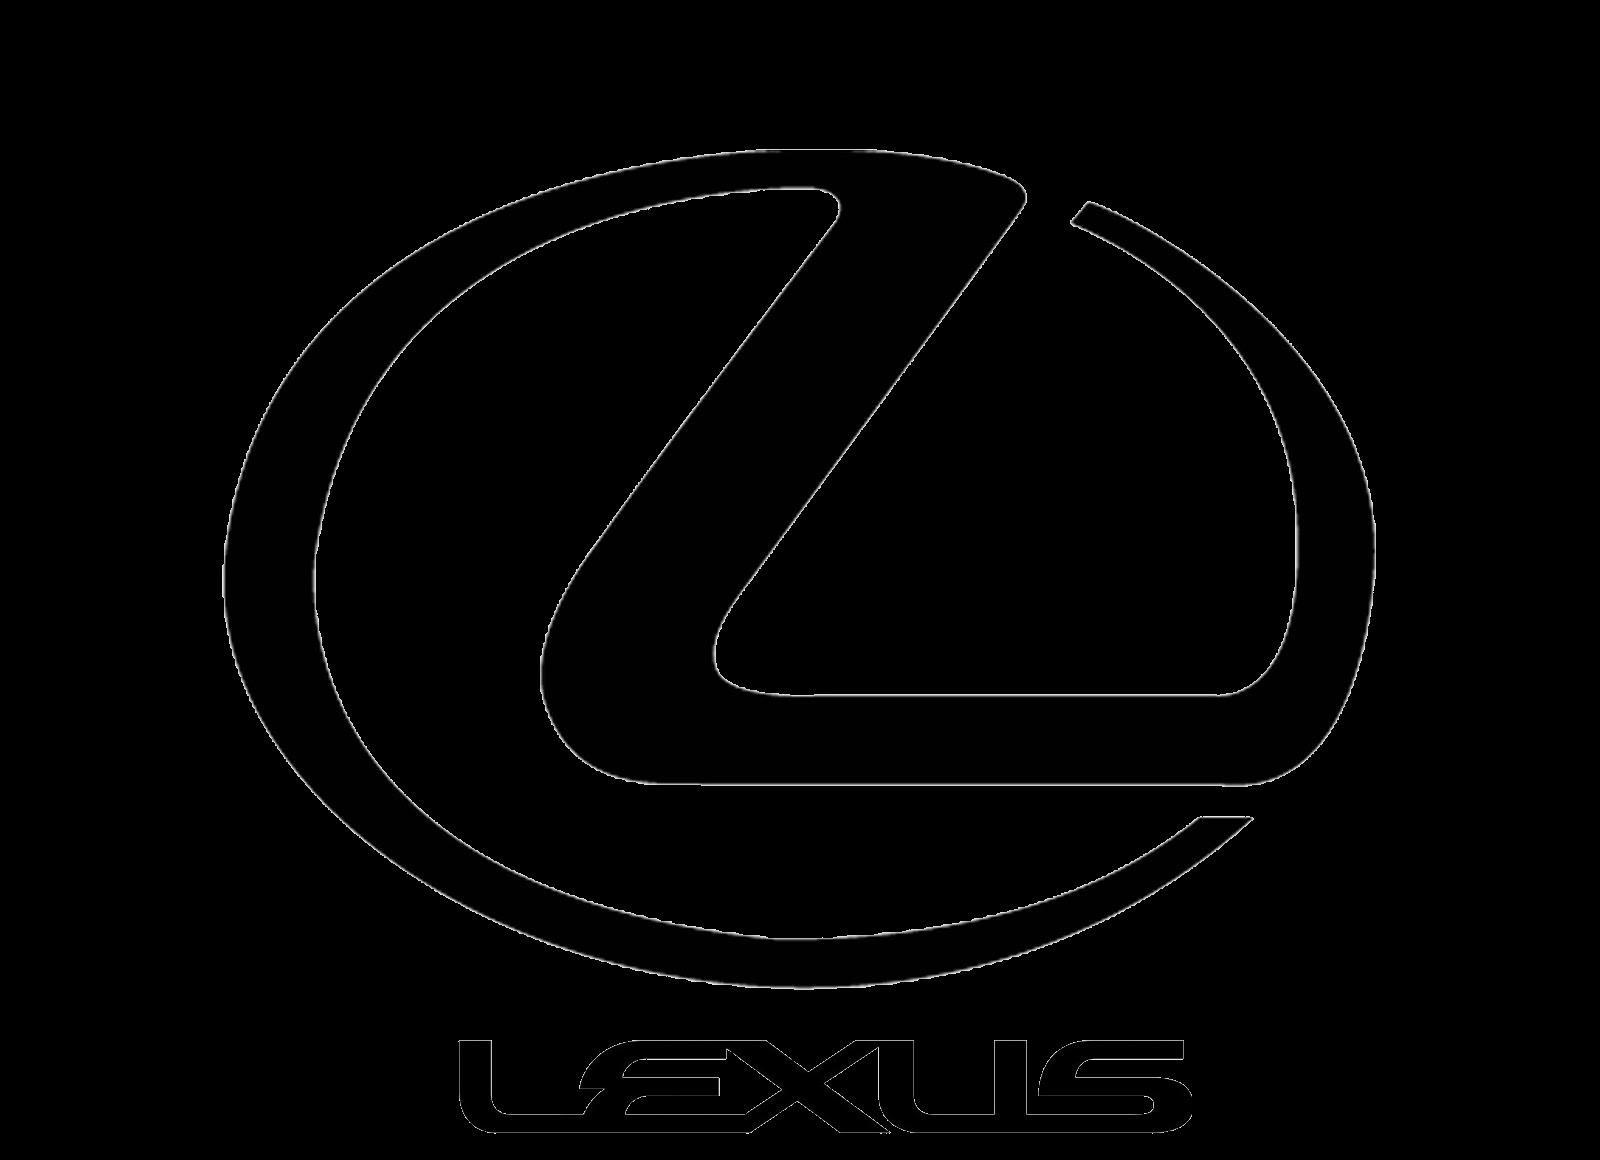 Lexus Car Logo Lexus Logo Car Logos Luxury Car Logos